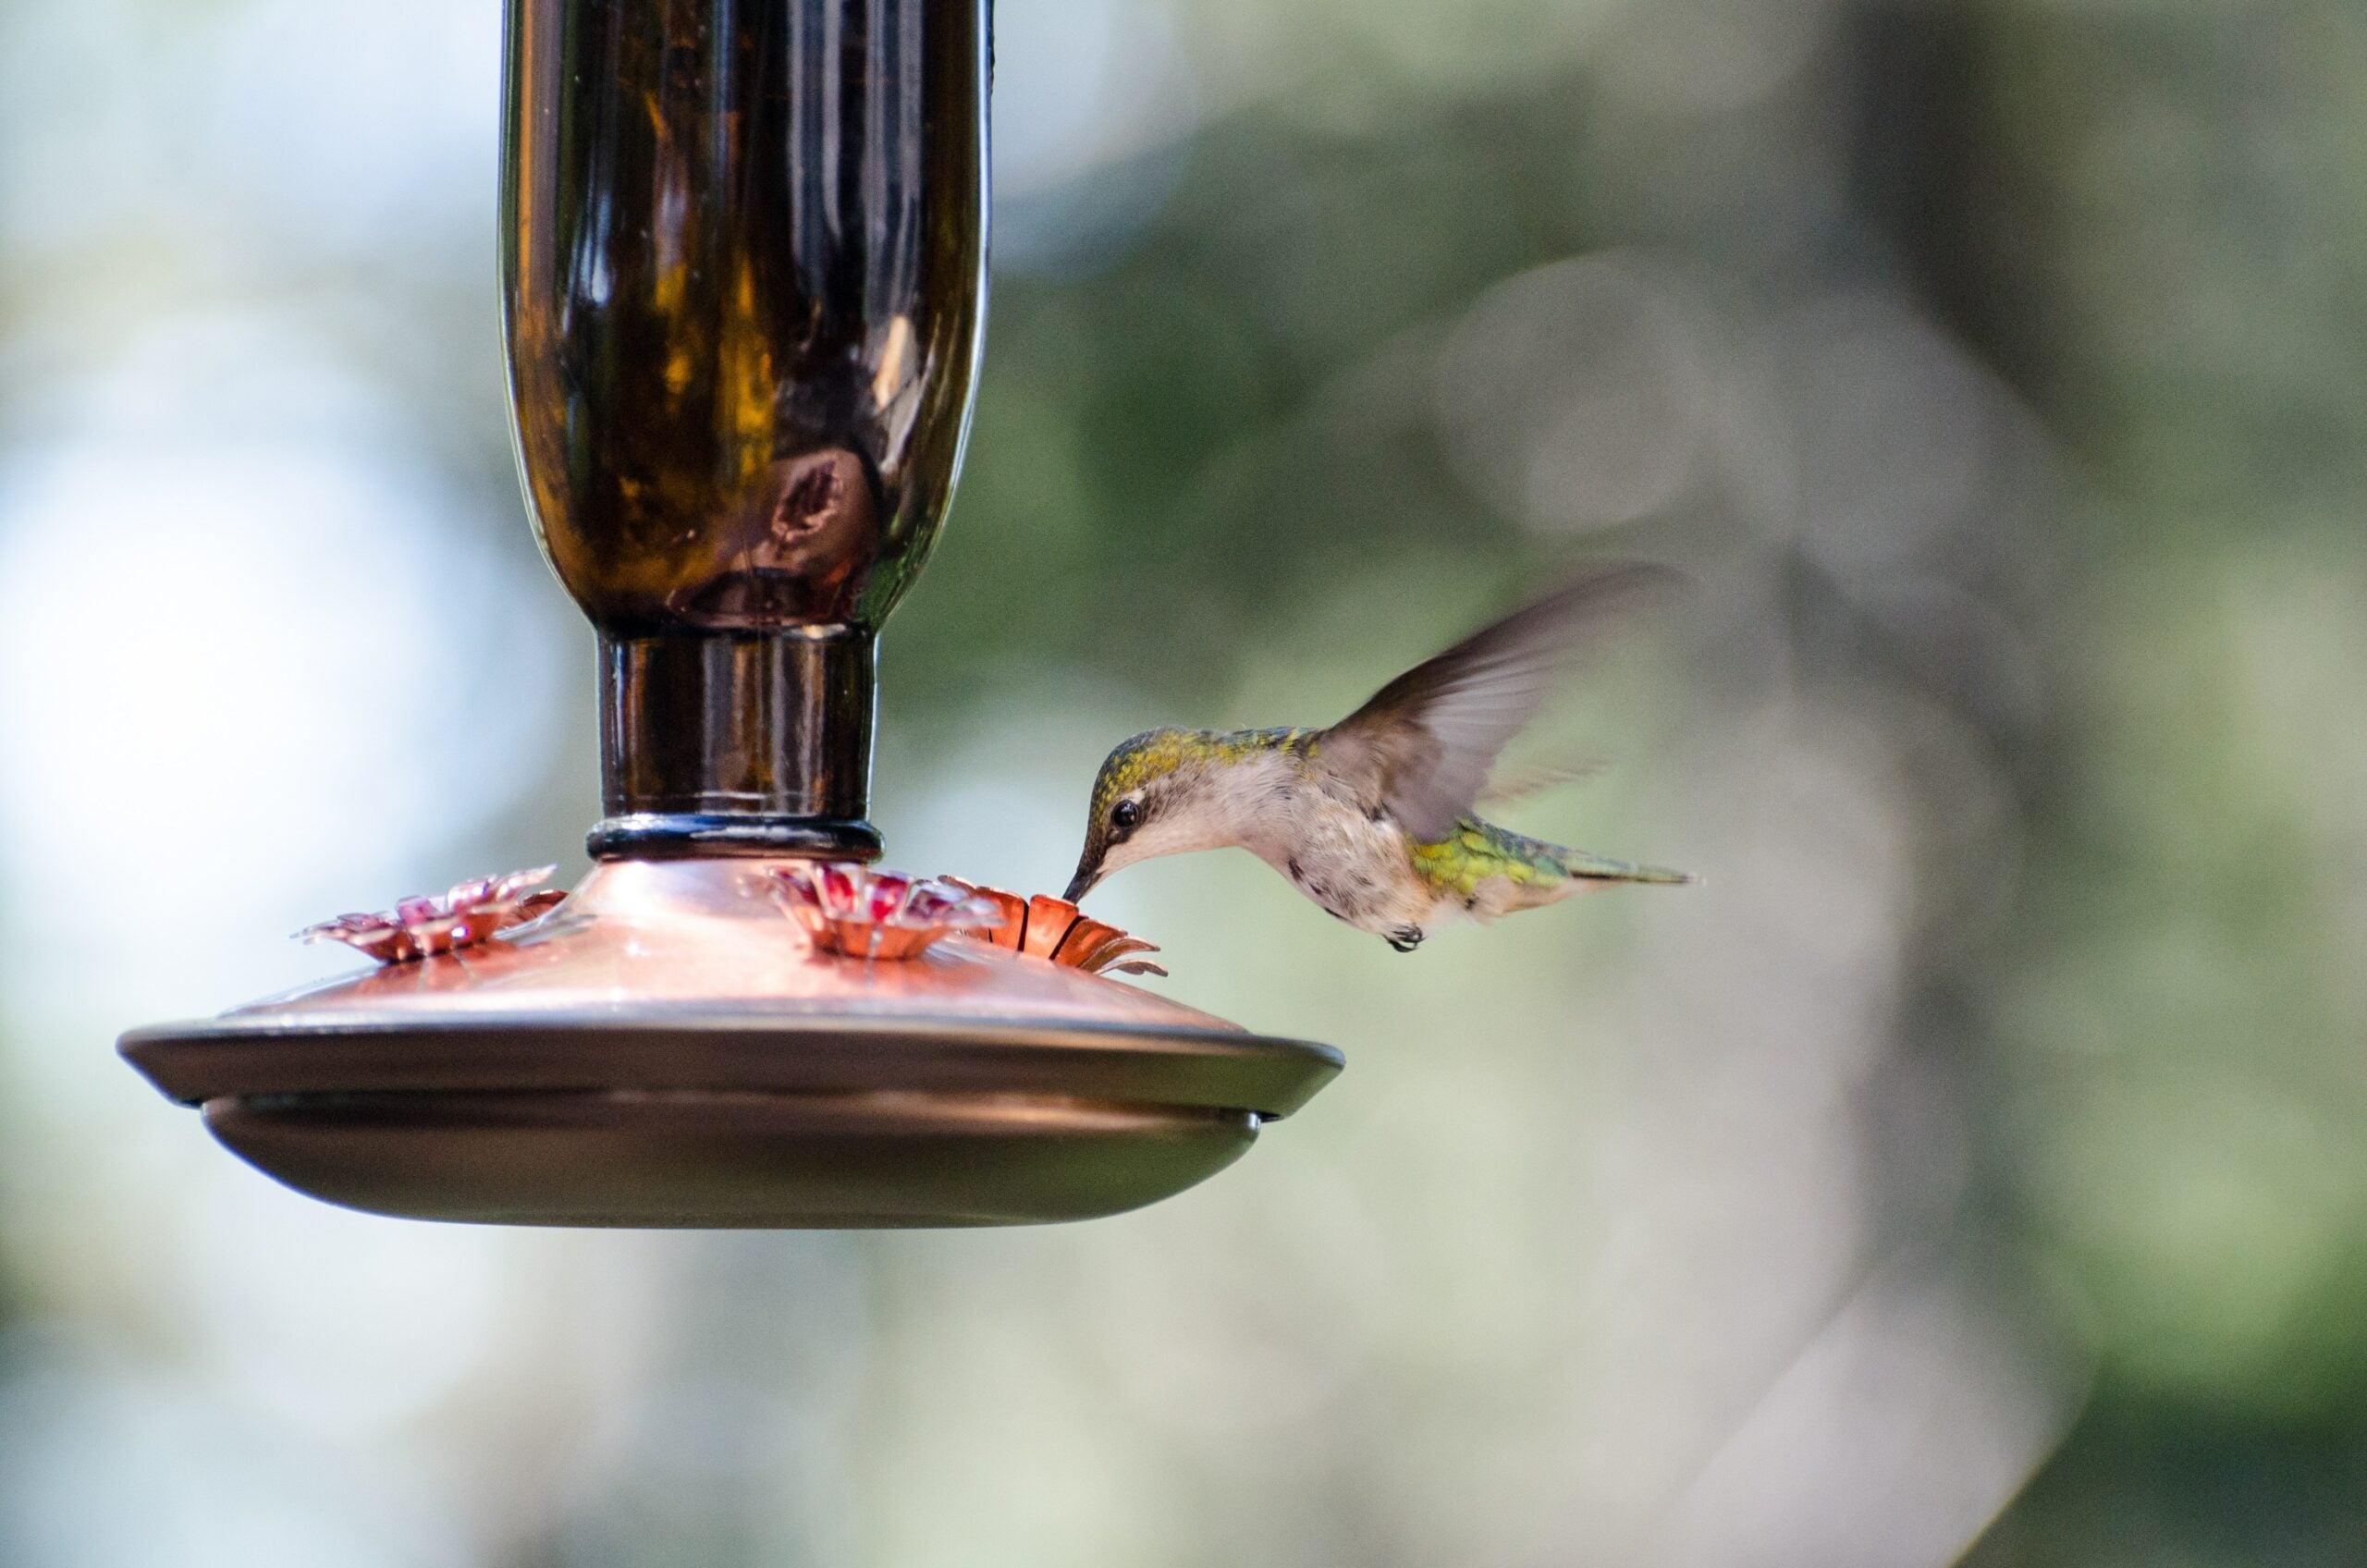 A ruby-throated hummingbird dips into a nectar feeder.